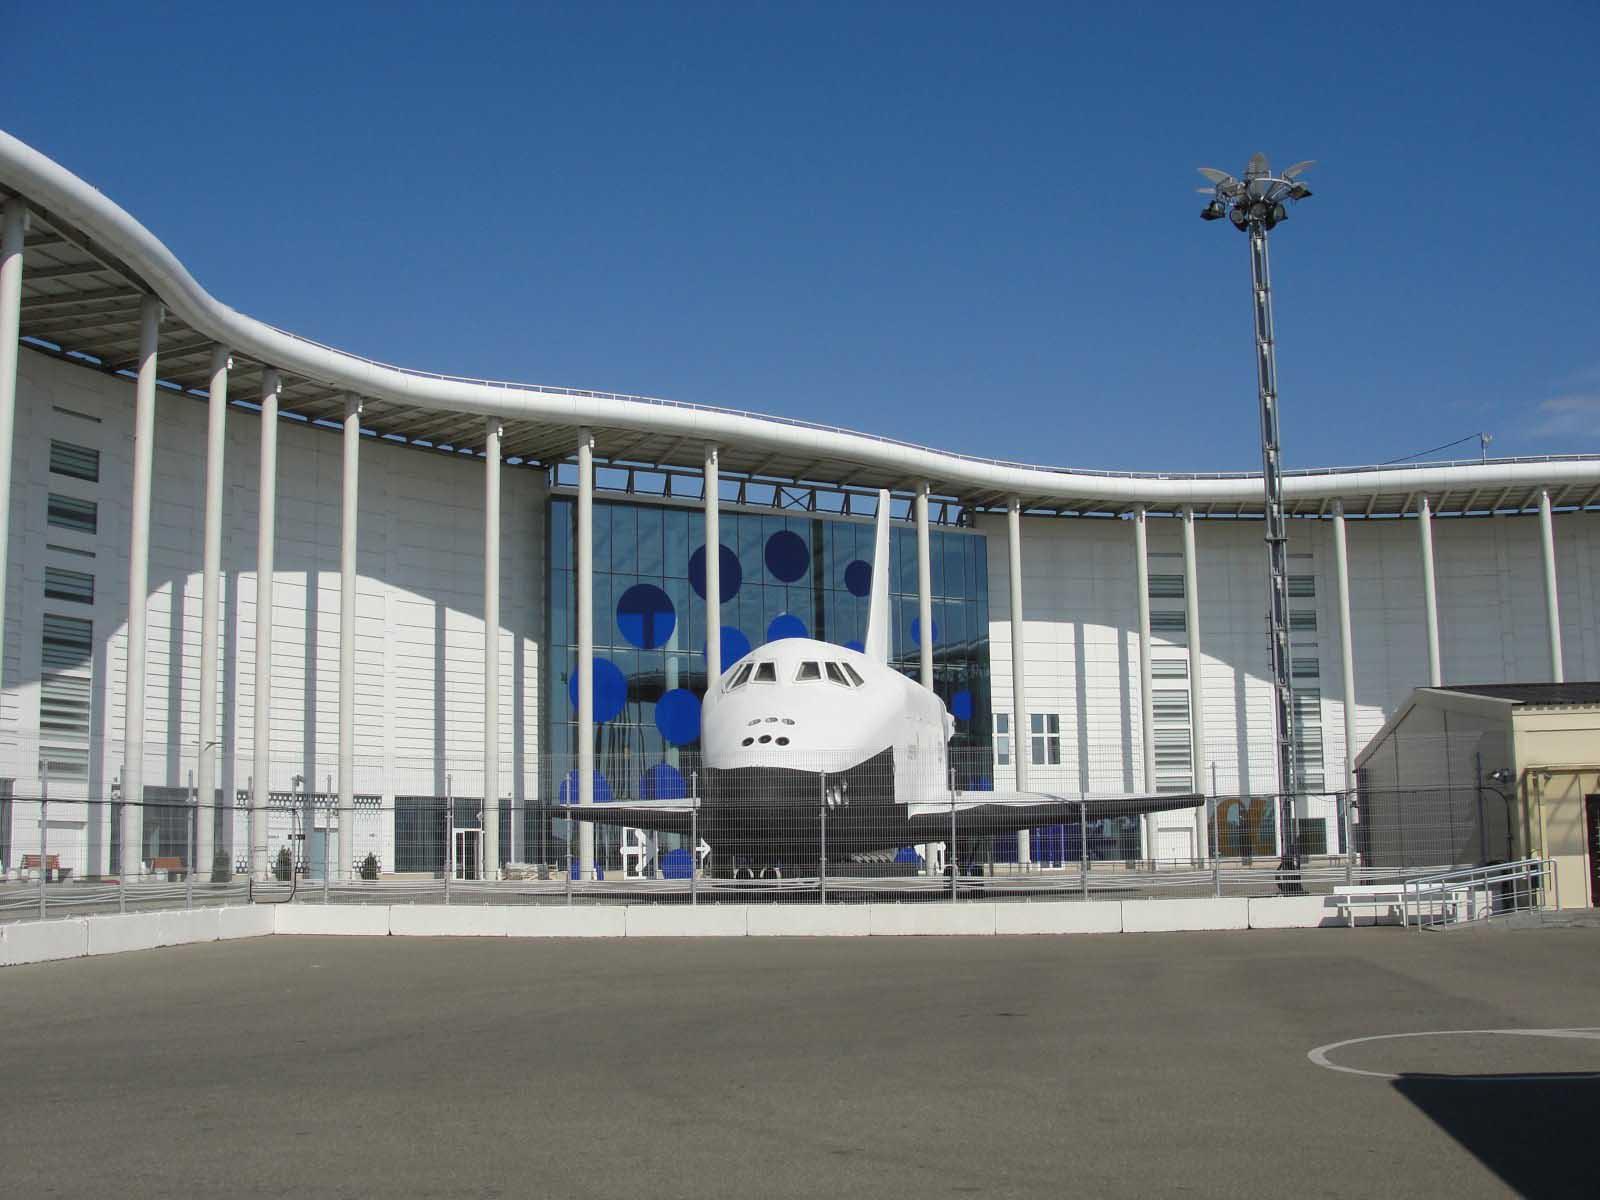 Космический шаттл Буран олимпийский парк